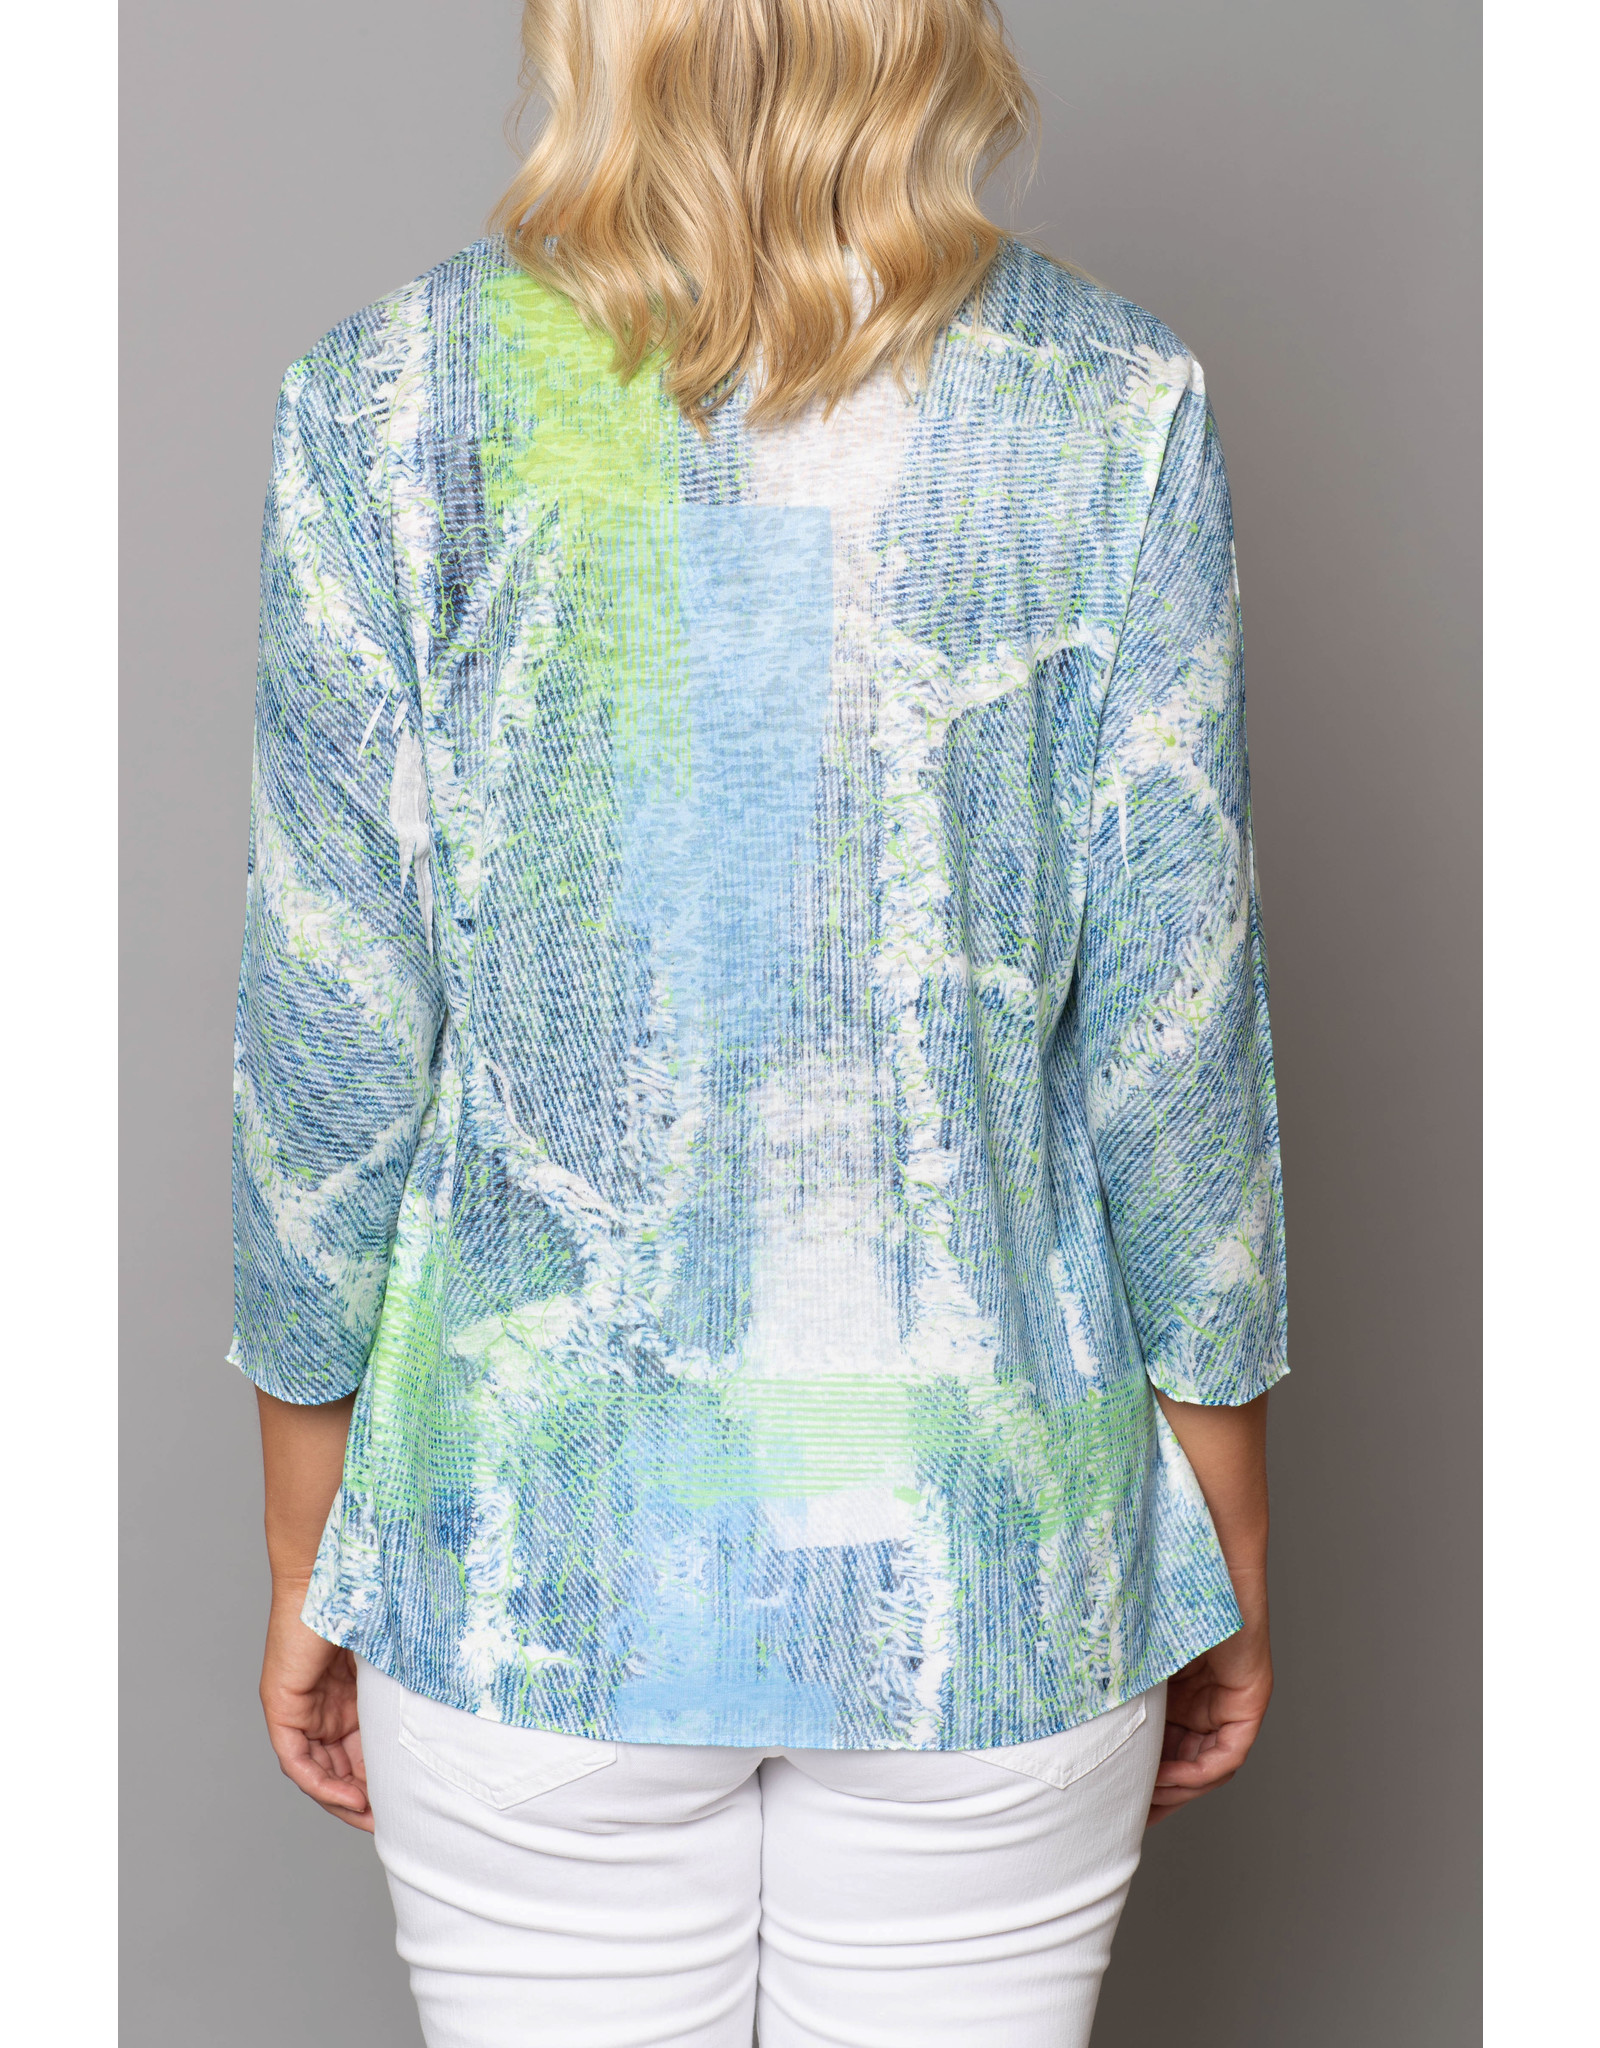 Peruzzi  Abstract Print Long Sleeve Top